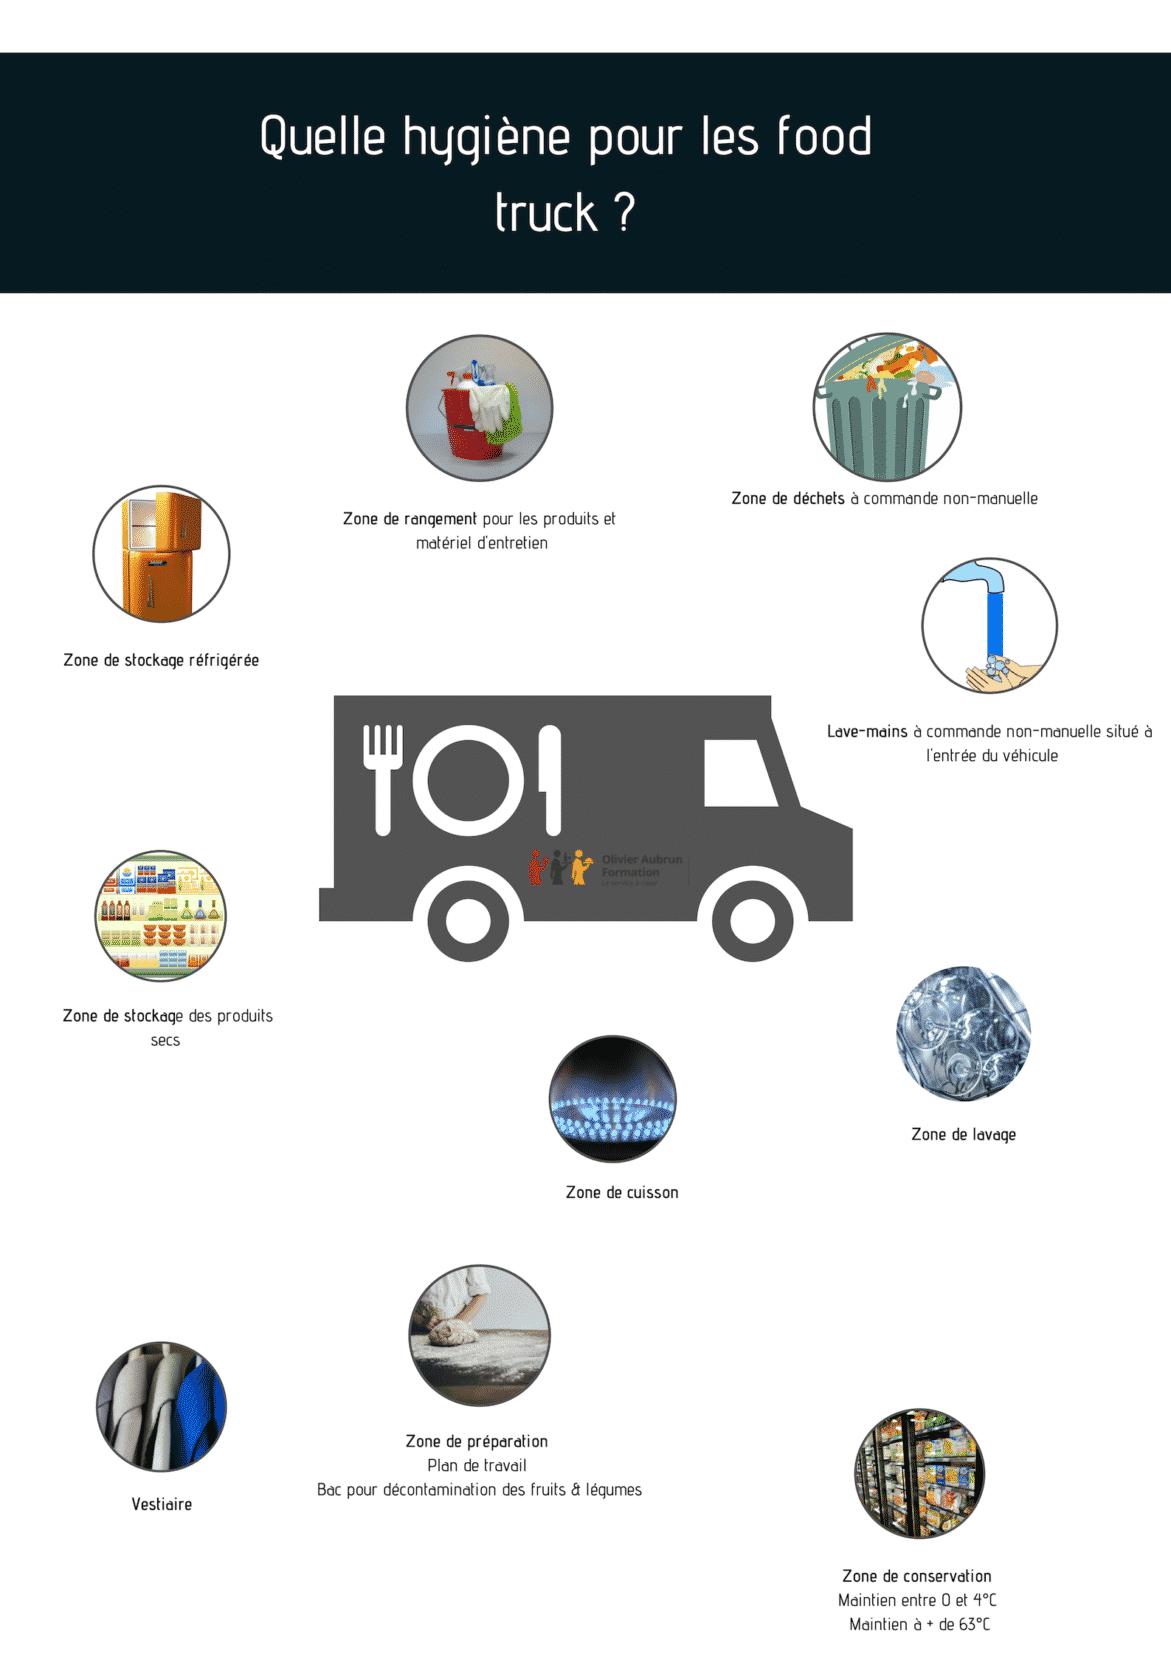 Hygiène dans les food trucks